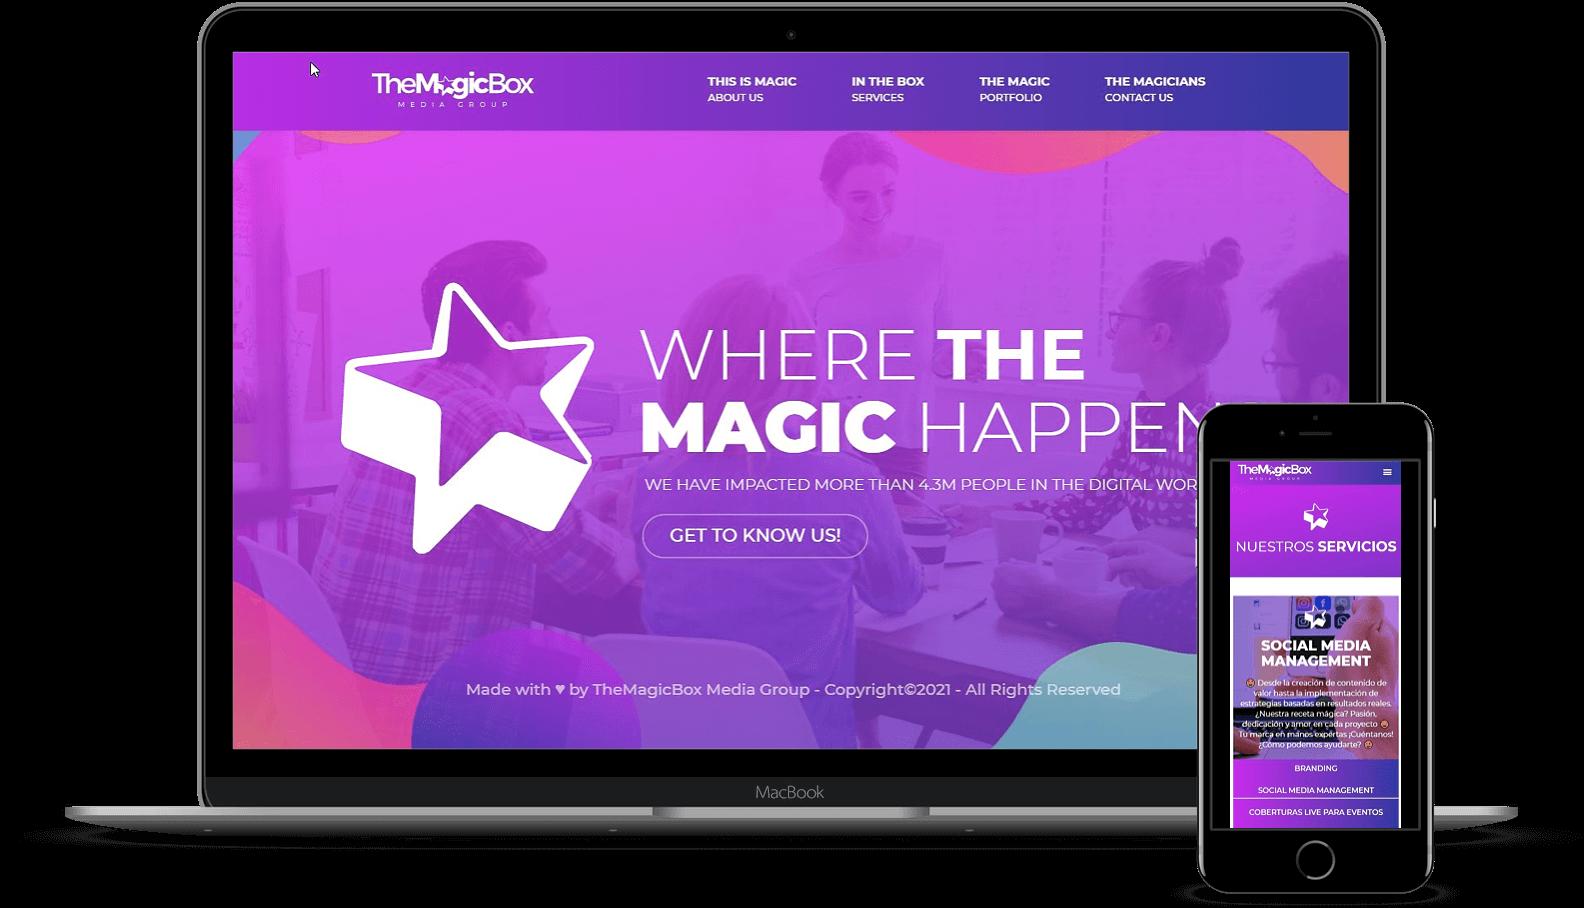 themagicbox-web-wordpress-devices-raylinaquino